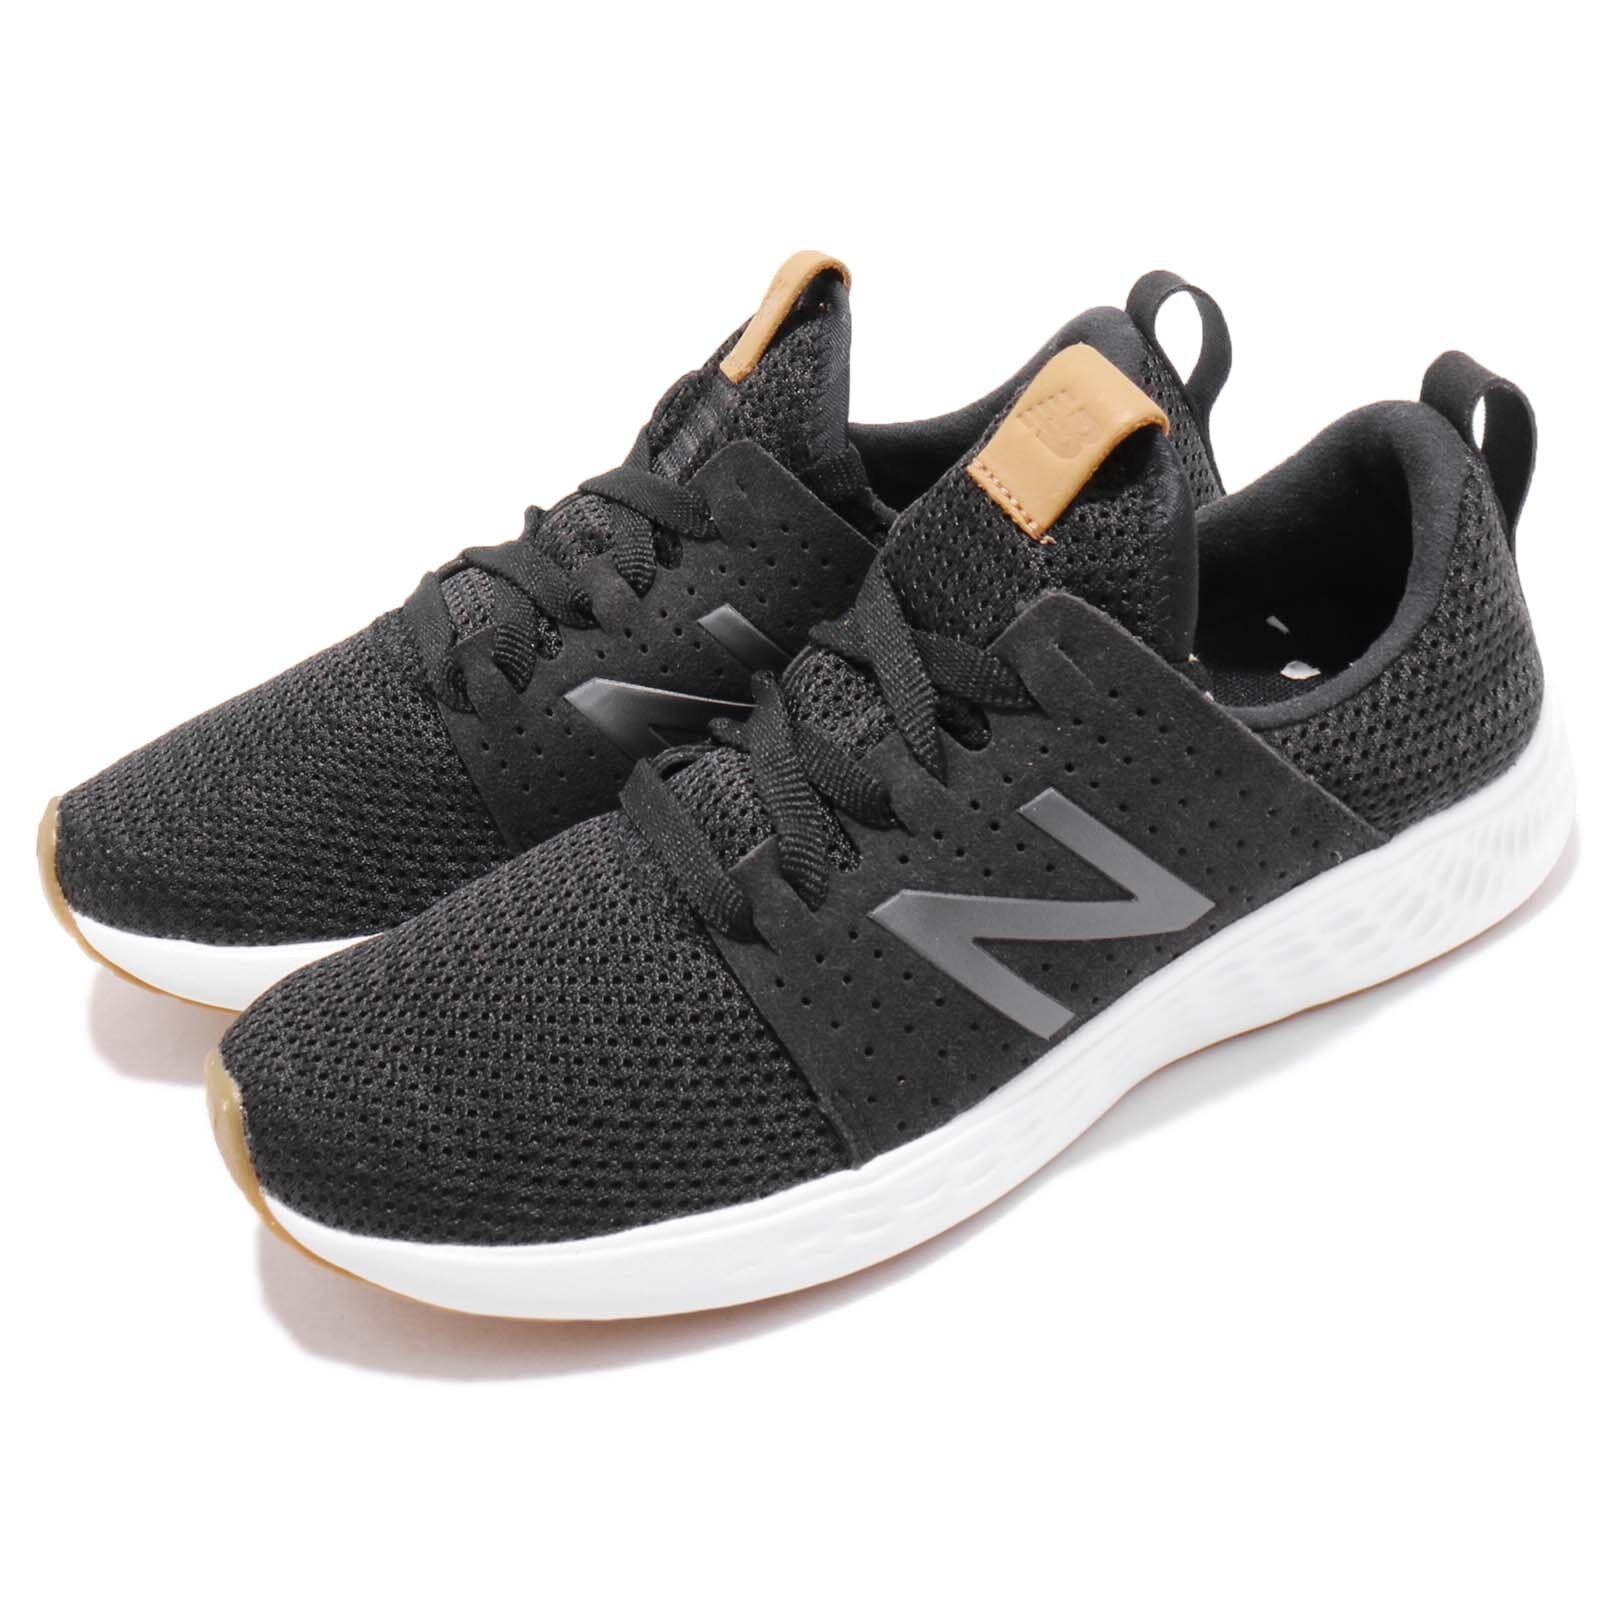 New Balance WSPTLB1 B Black Black Black Grey White Gum Women Running shoes Sneakers WSPTLB1B a36cd6